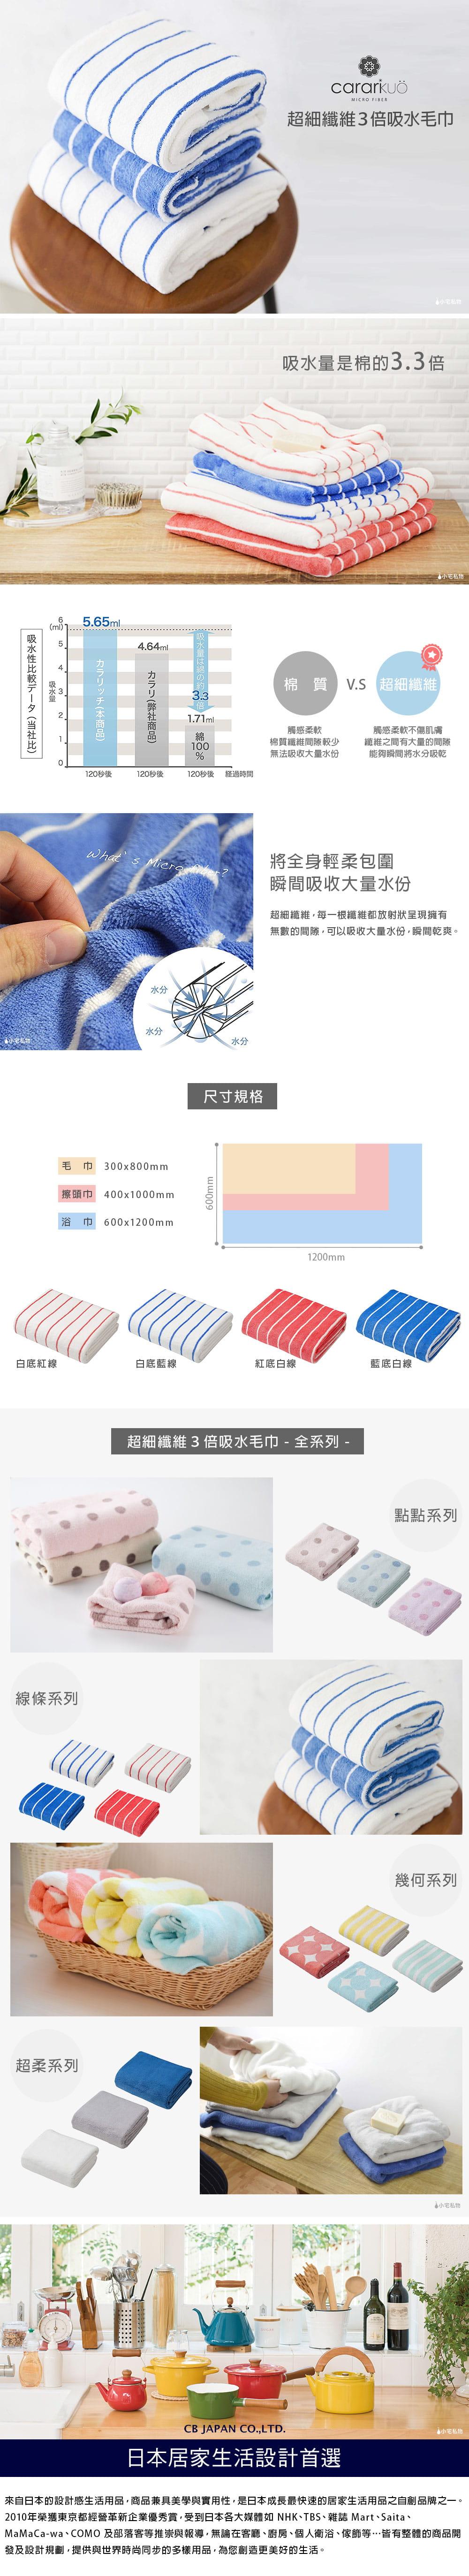 CB Japan 泡泡糖 線條系列 超細纖維3倍吸水擦頭巾 - 白底藍線